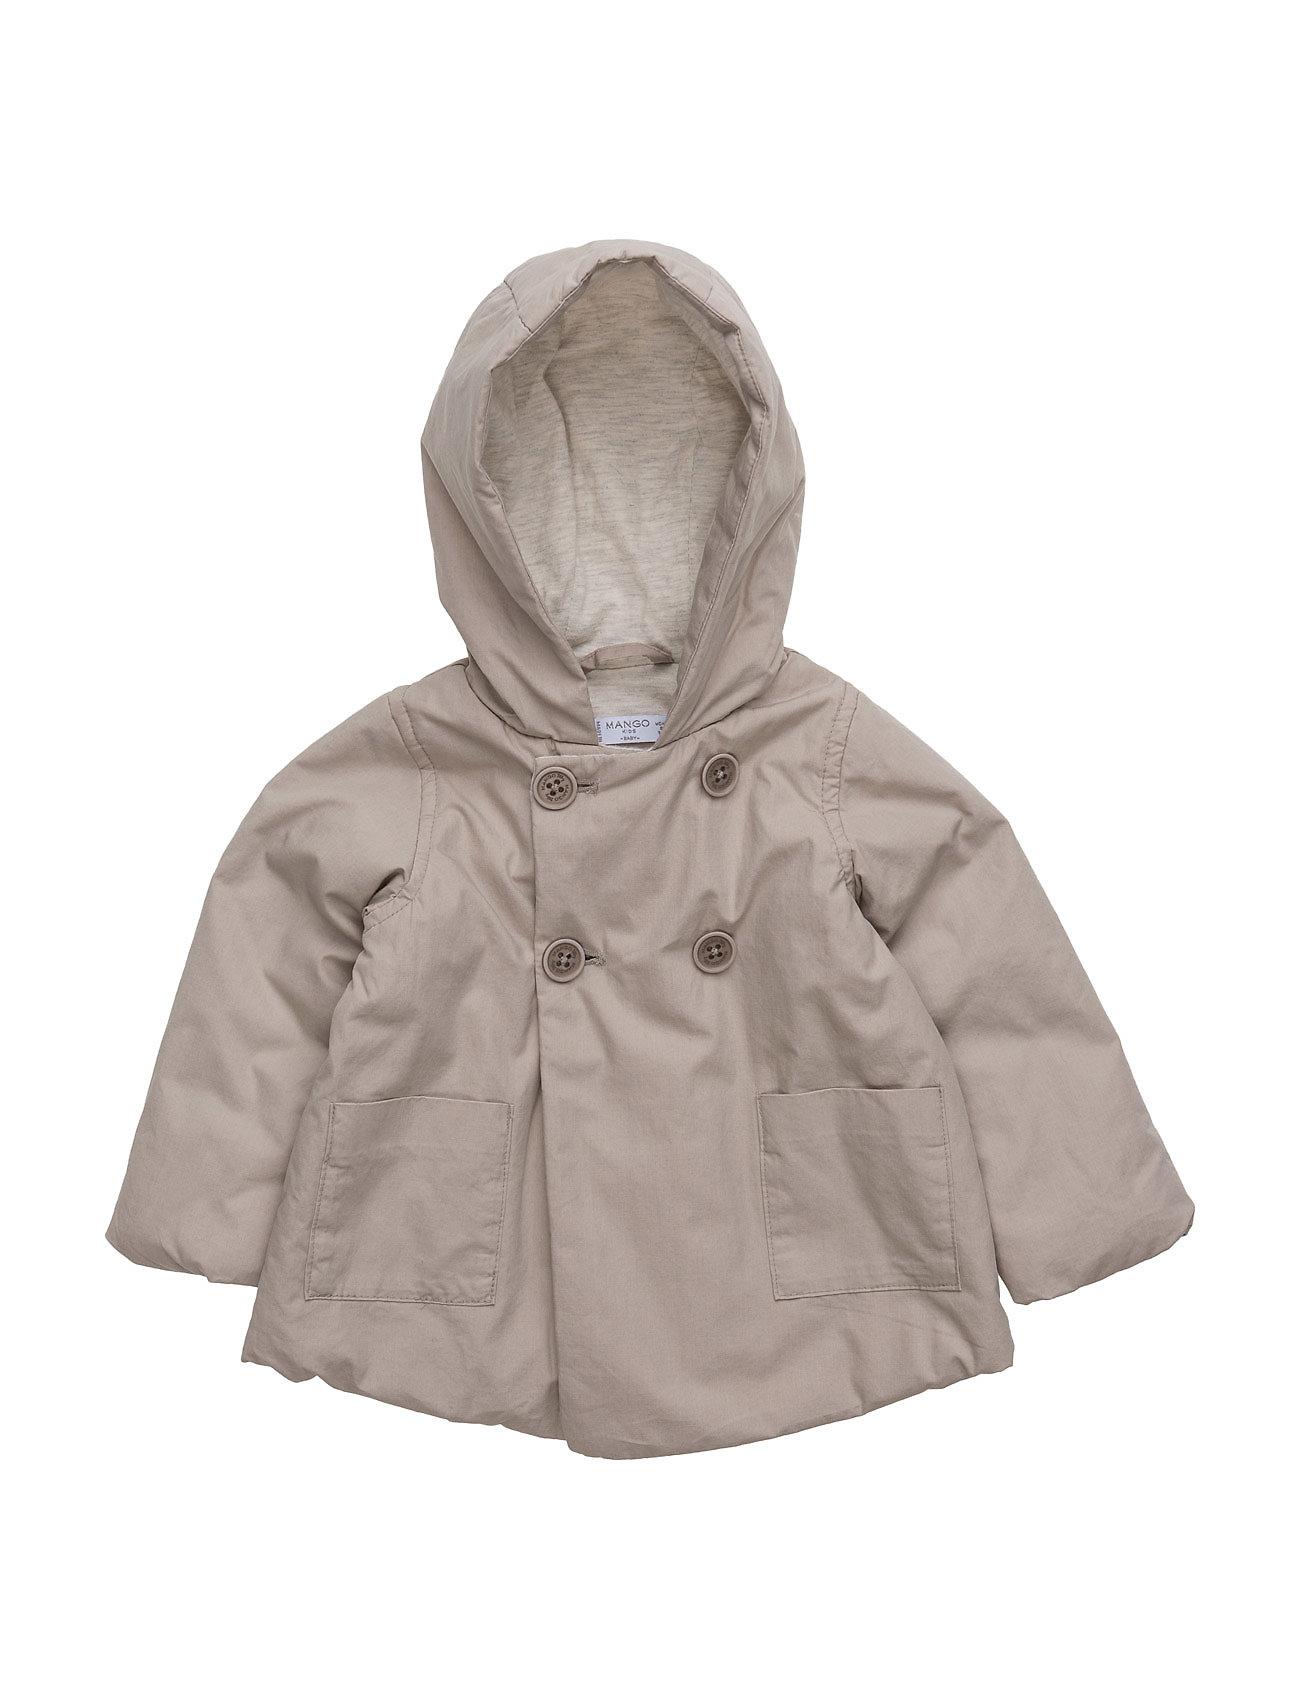 e23813b8 De lekreste Buttoned Cotton Coat Mango Kids Jakker & Kåper til i fantastisk  kvalitet